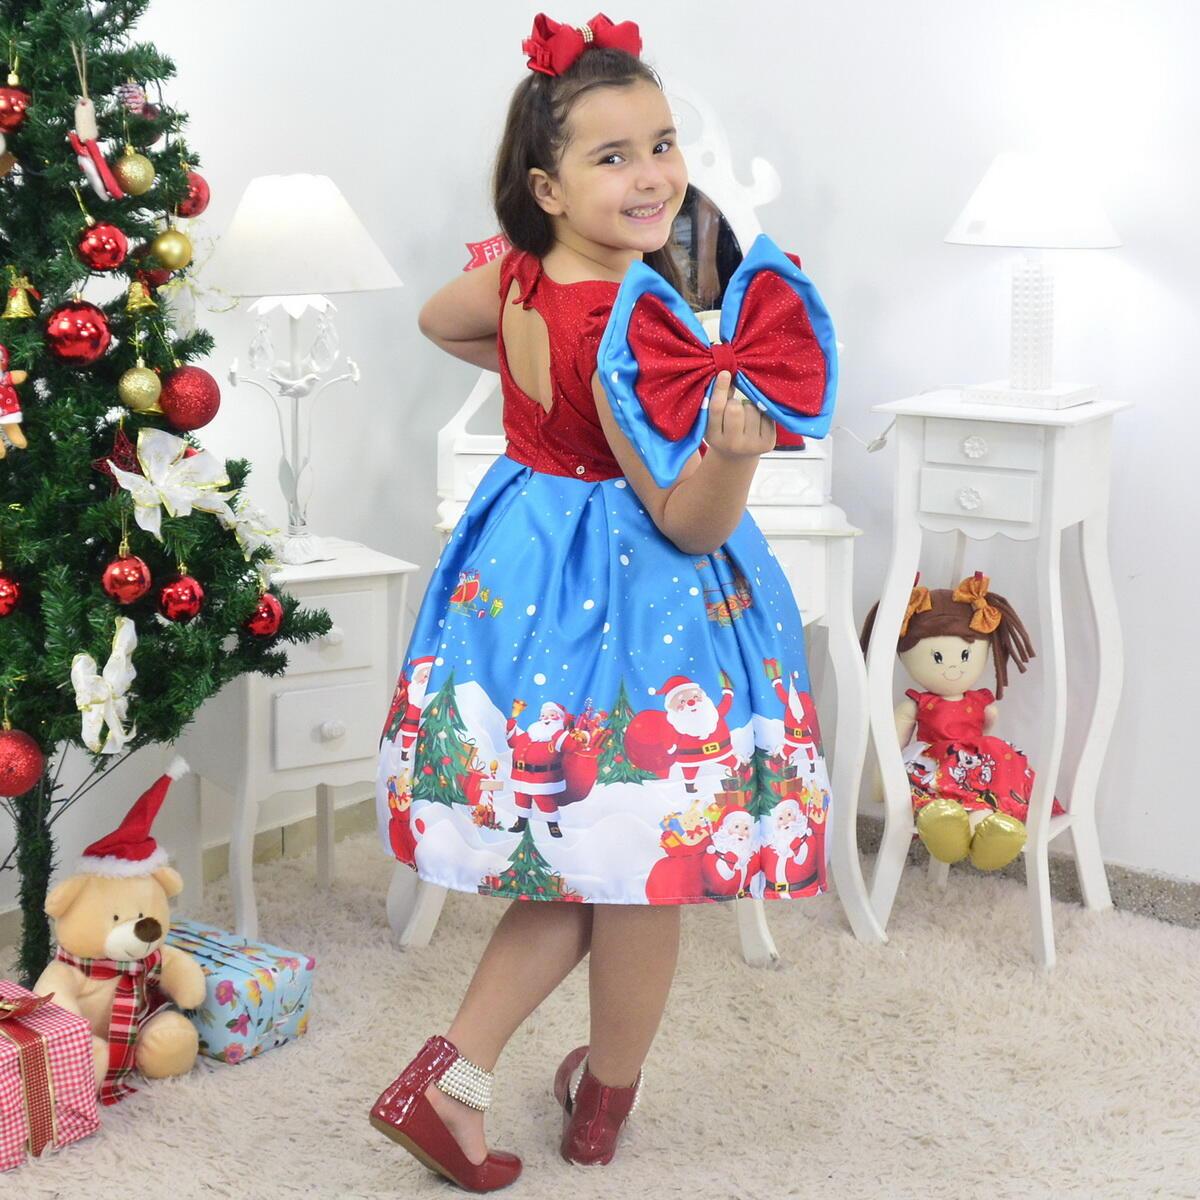 Vestido Papai Noel Com Urso de Pelúcia